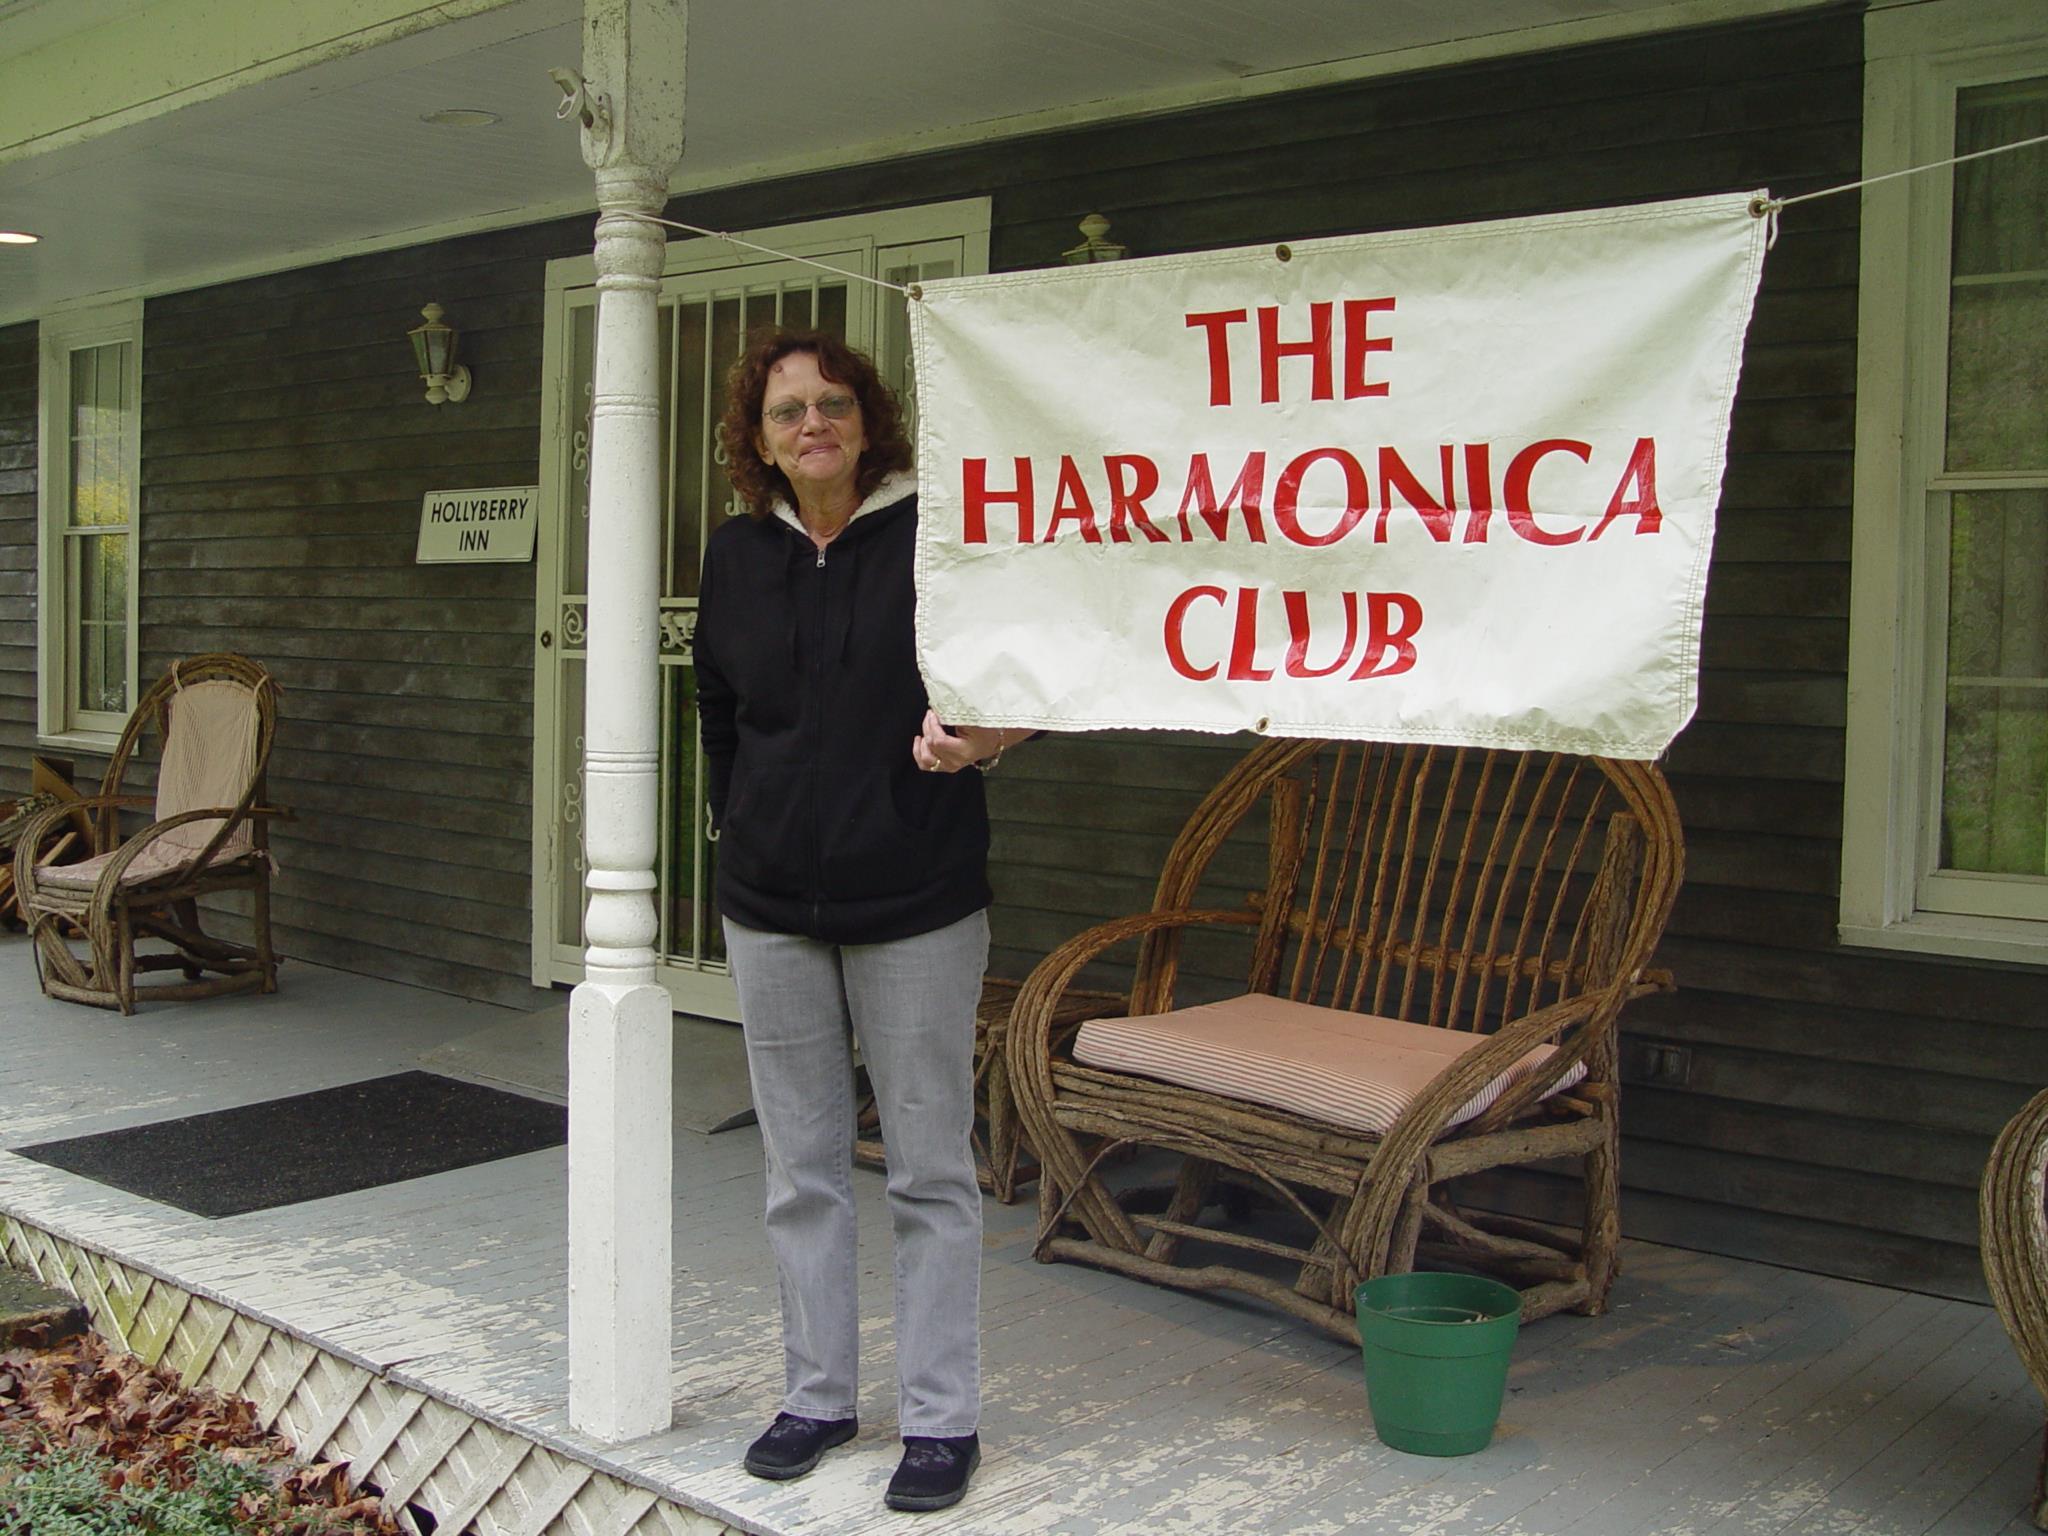 Oct 05, 2020· sweet home chicago harmonica tab. Harmonica Club Free Lessons Tabs Downloads Huntington Wv